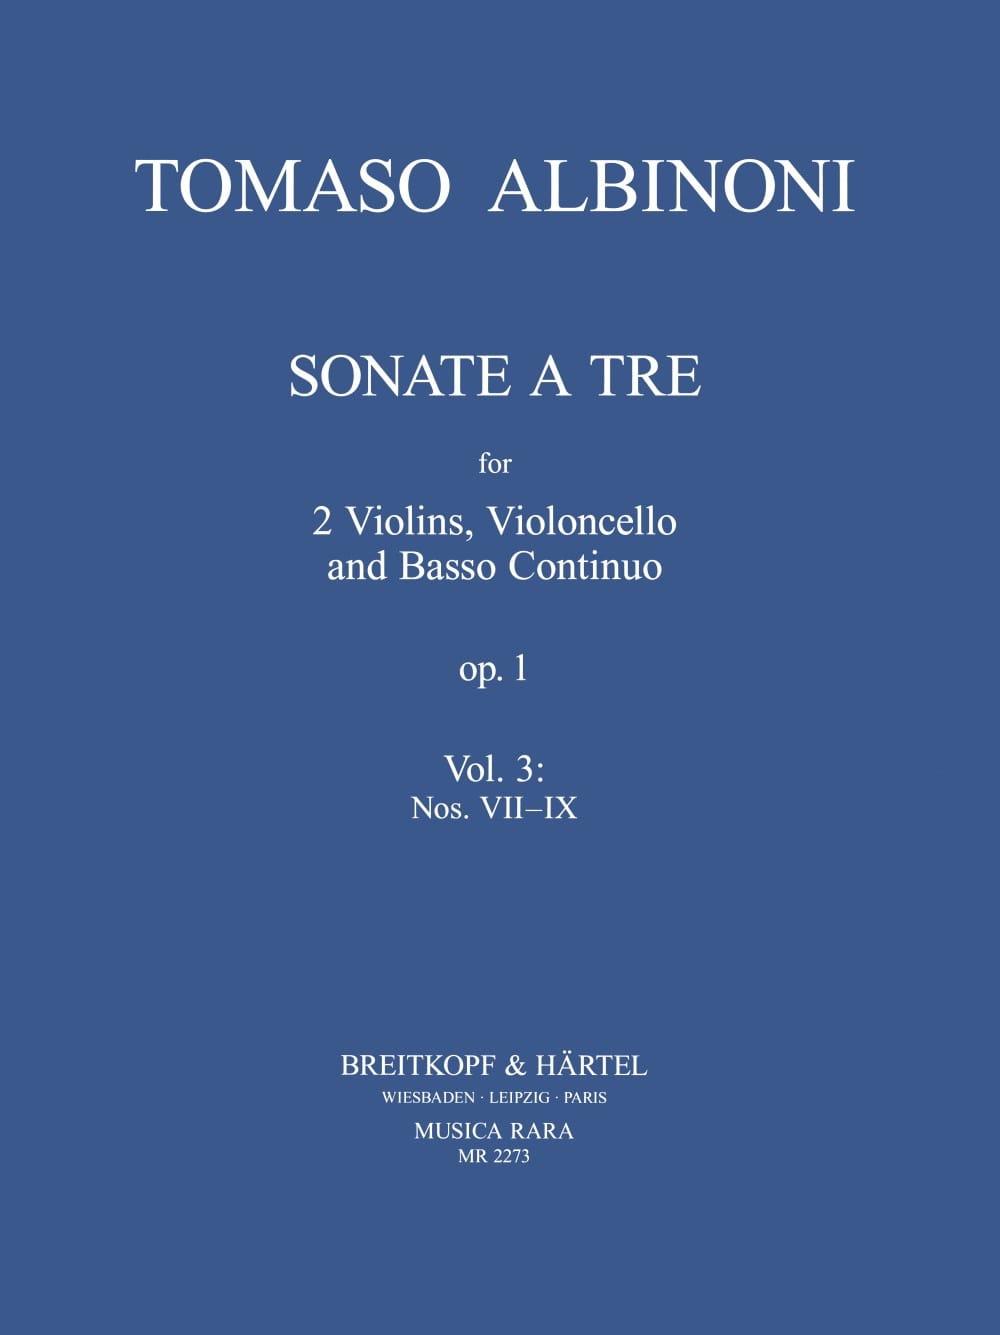 Sonate A Tre Op.1 Vol.3 - ALBINONI - Partition - laflutedepan.com